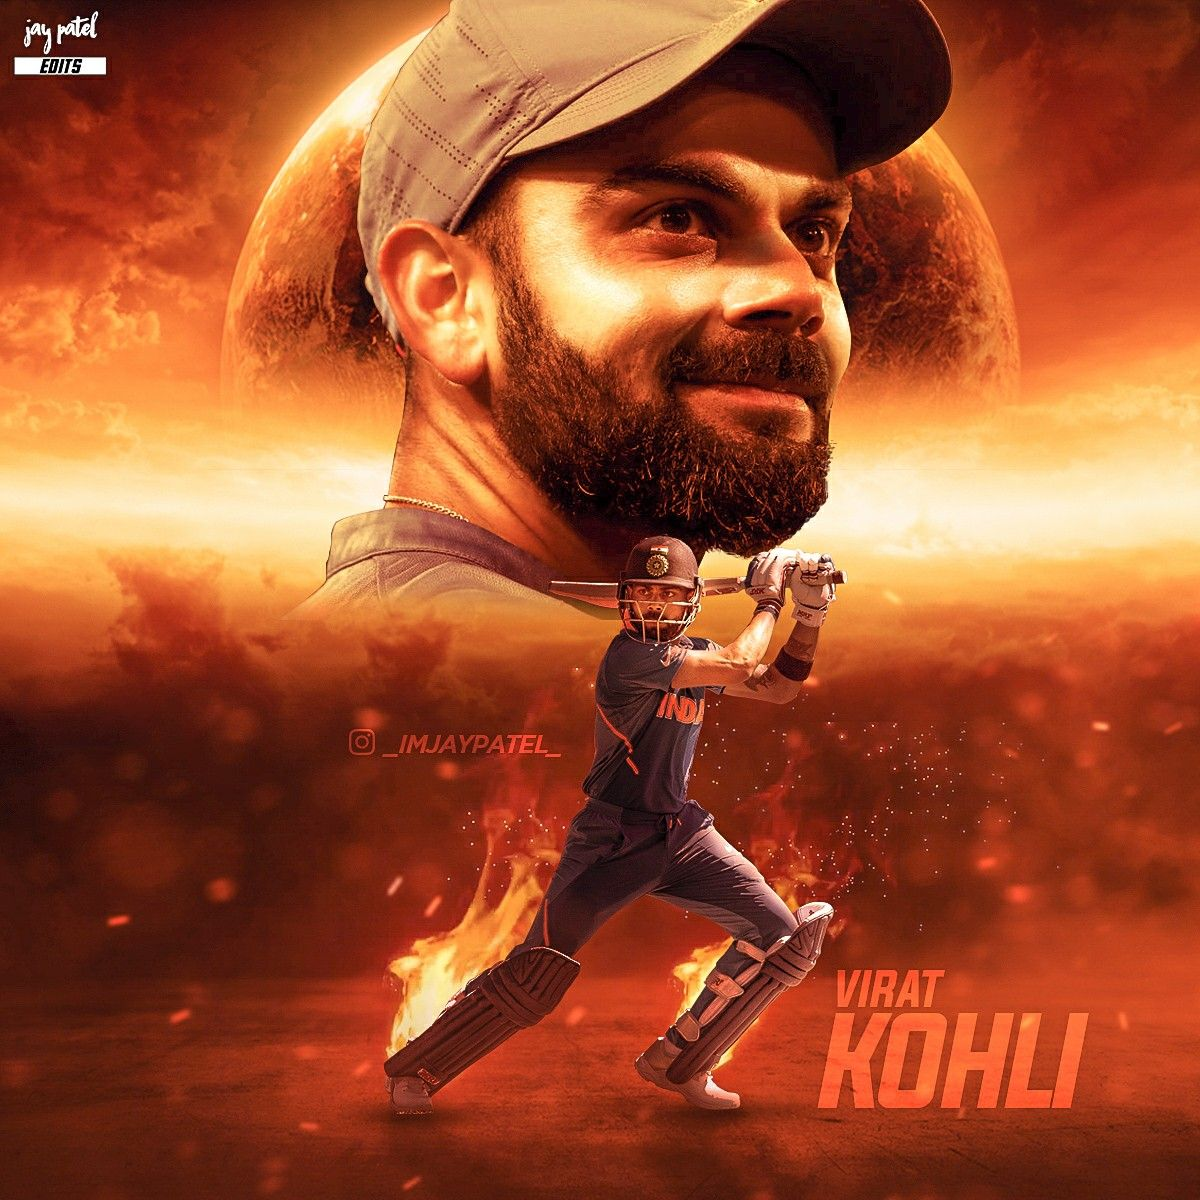 Pin By Madhunisha Bala On Virat Kohli In 2020 Virat Kohli Instagram Cricket Wallpapers Virat Kohli Hairstyle